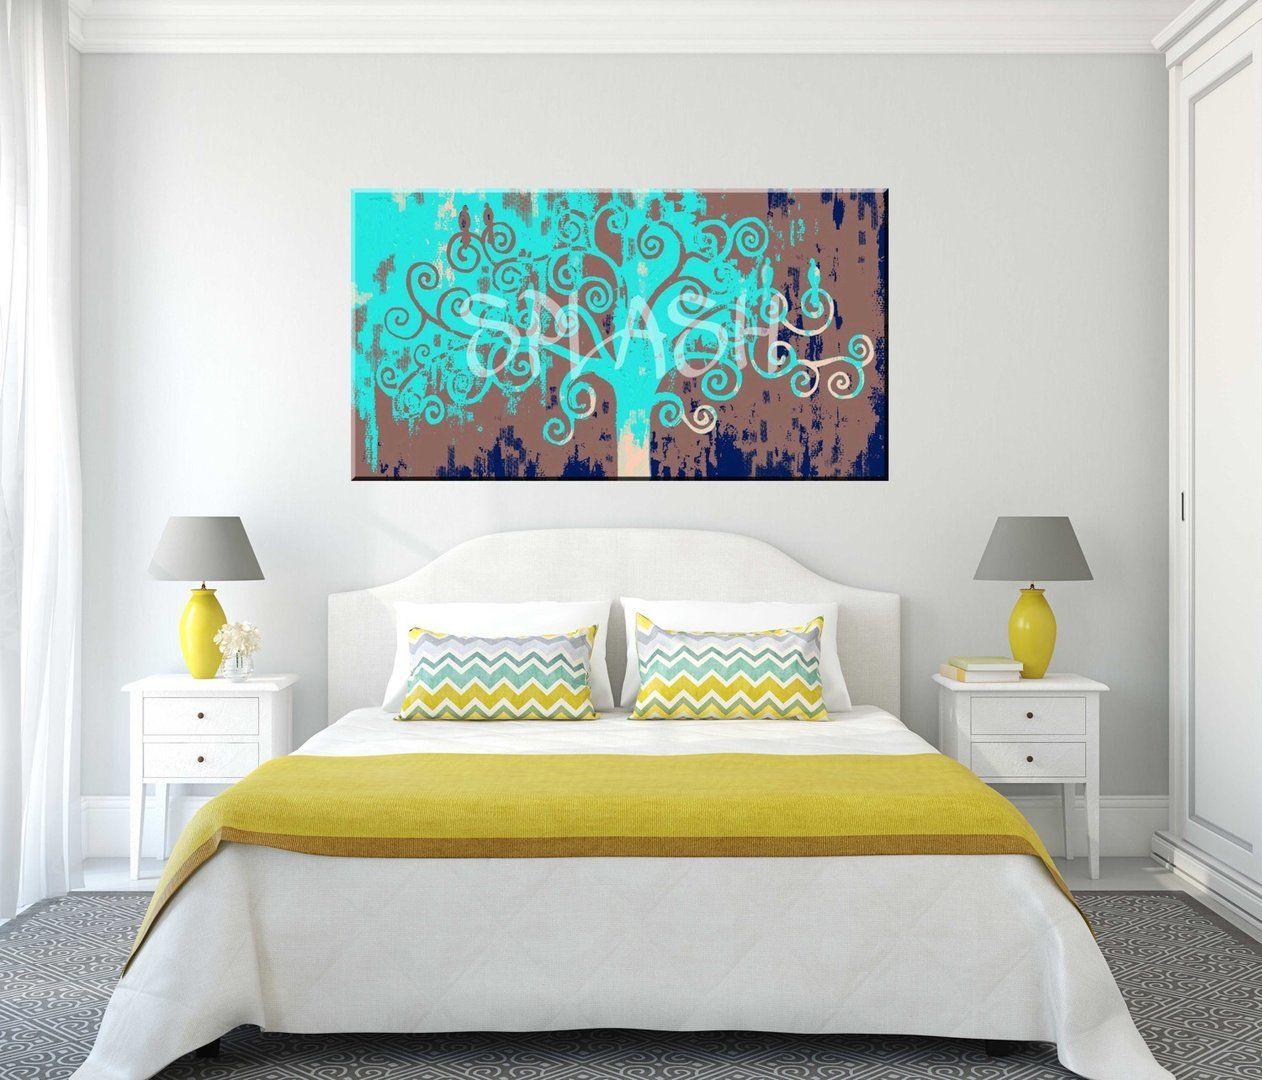 Cuadros modernos cuadros decorativos rbol vida para - Cuadros modernos para dormitorios ...